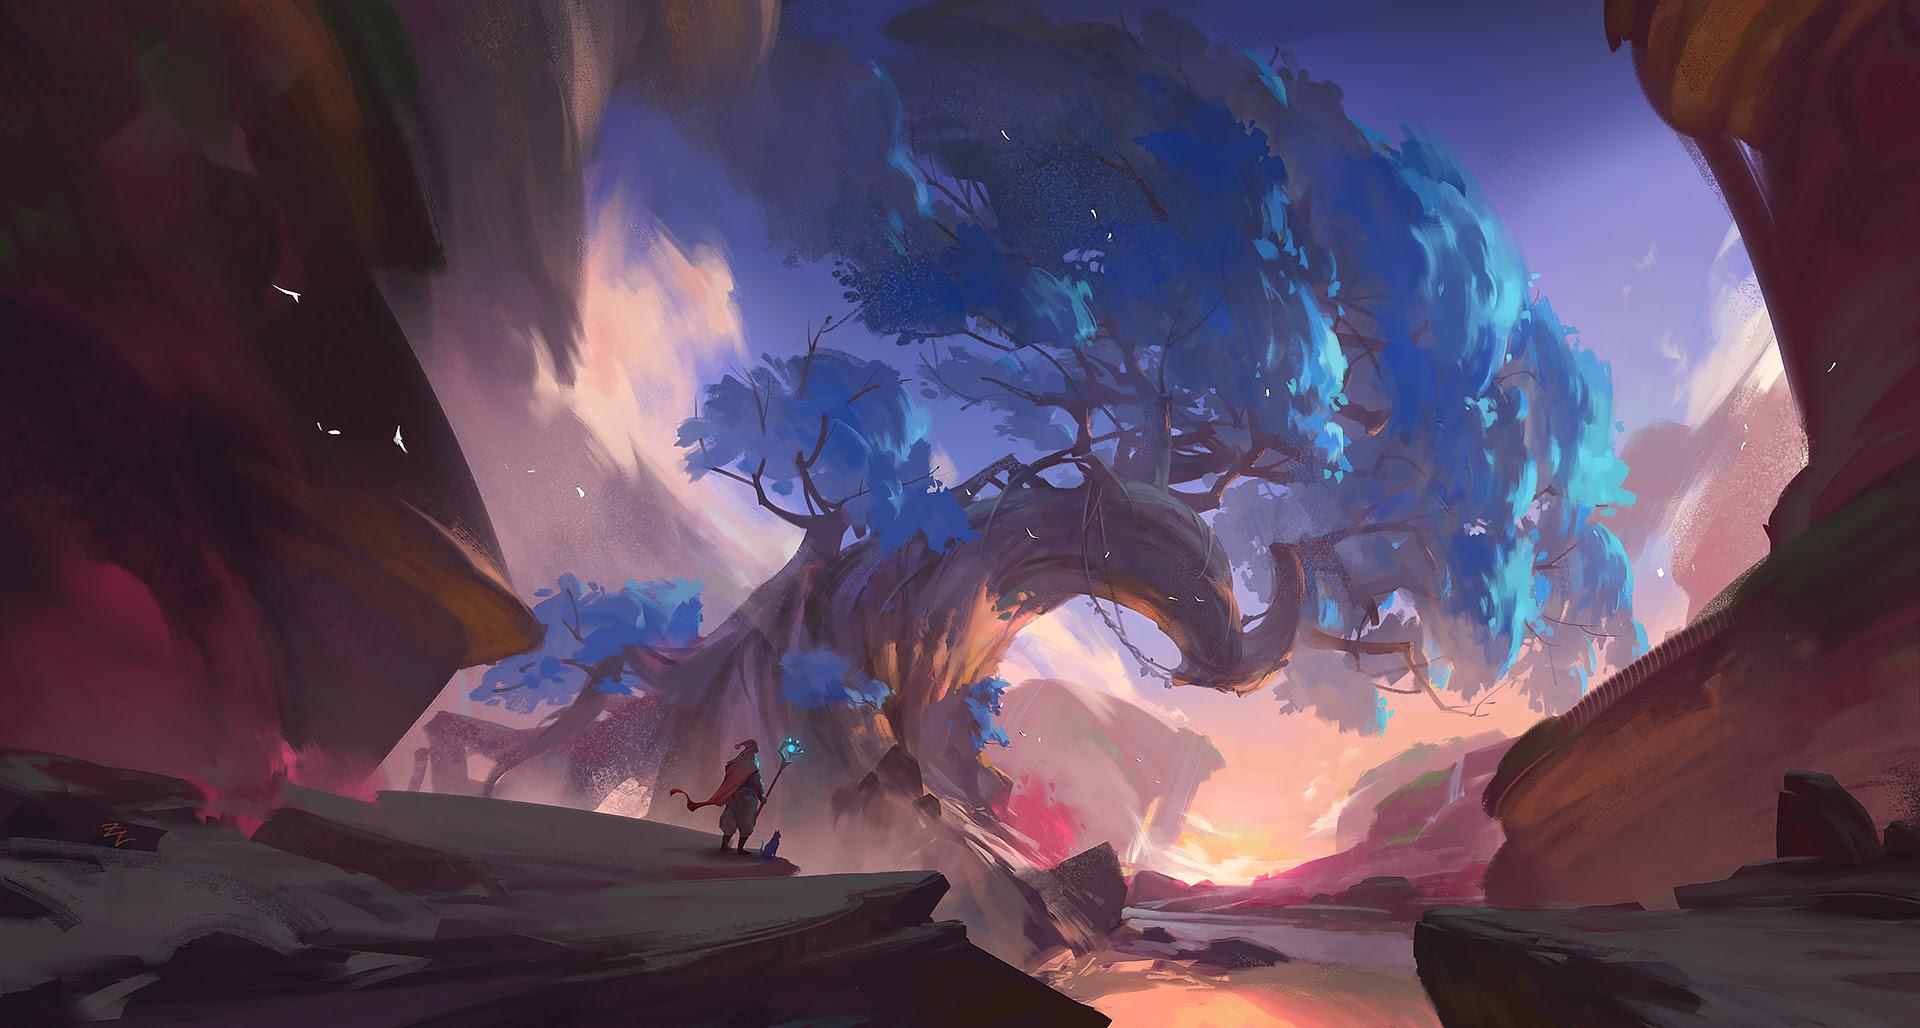 Warrior Dreamy Concept Fantasy Digital Art Artwork, HD ...